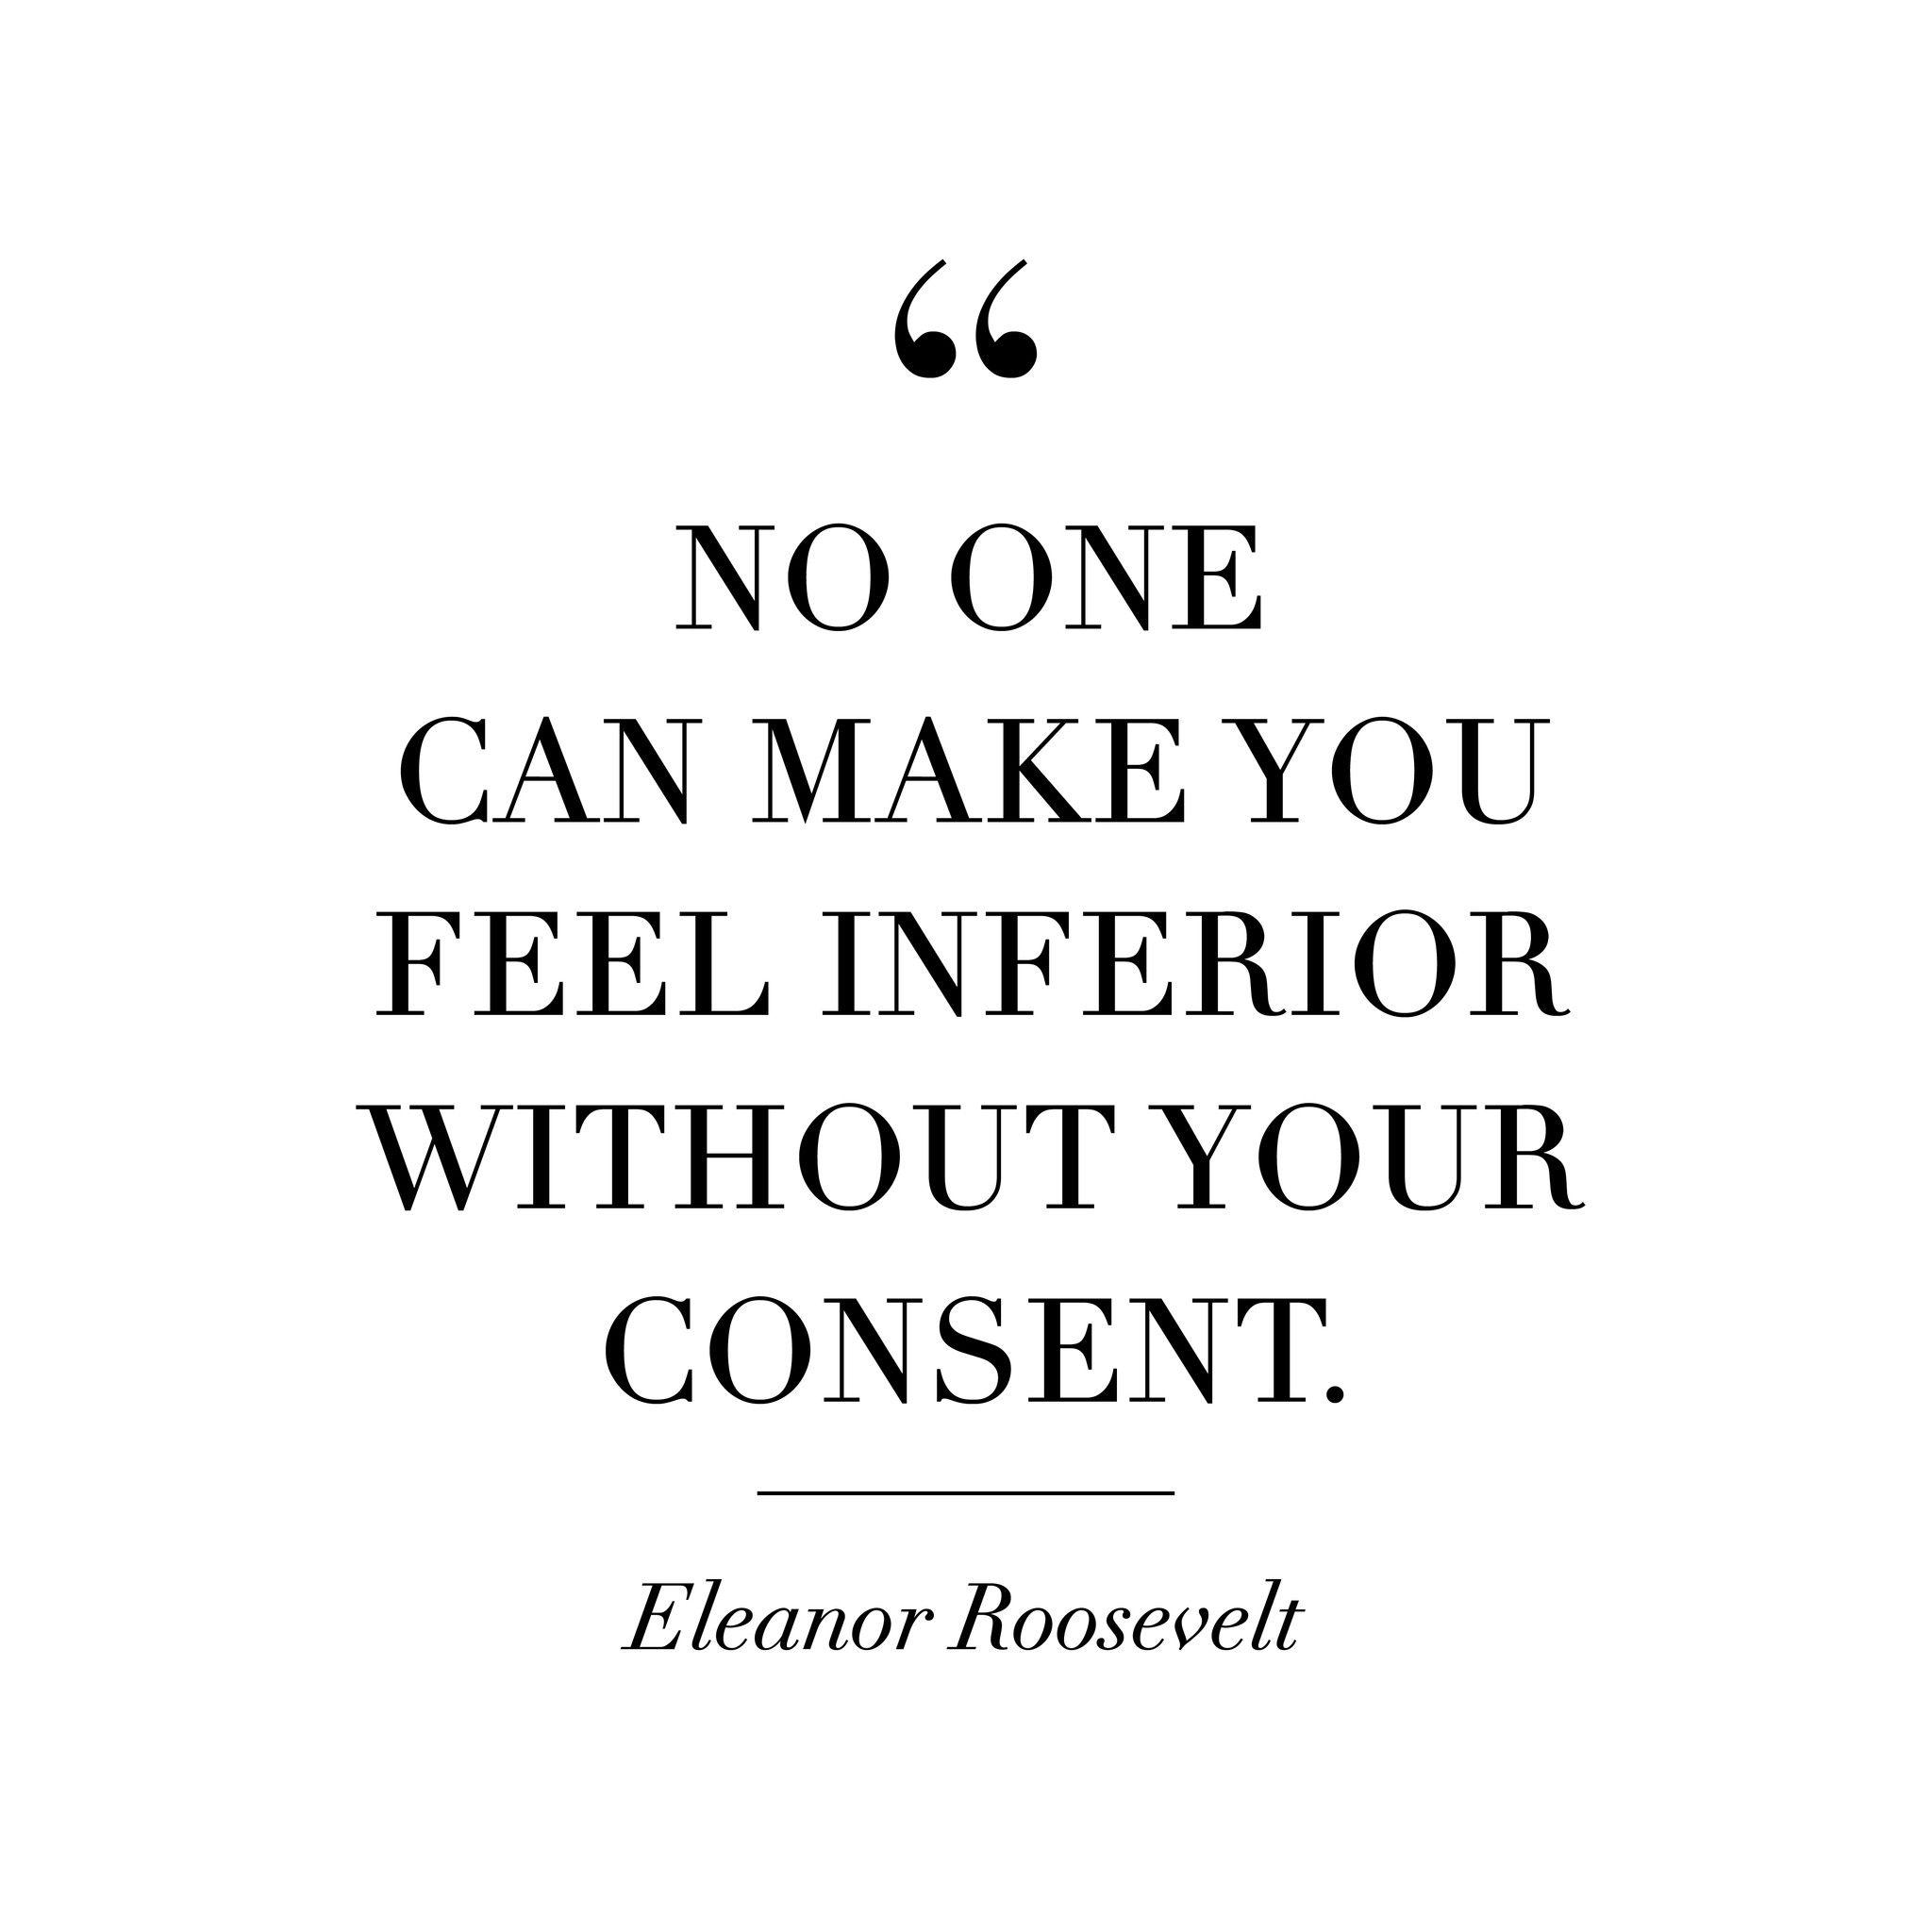 Girl Empowerment Quotes 8 Empowering Quotesinspirational Women  Inspirational Blog